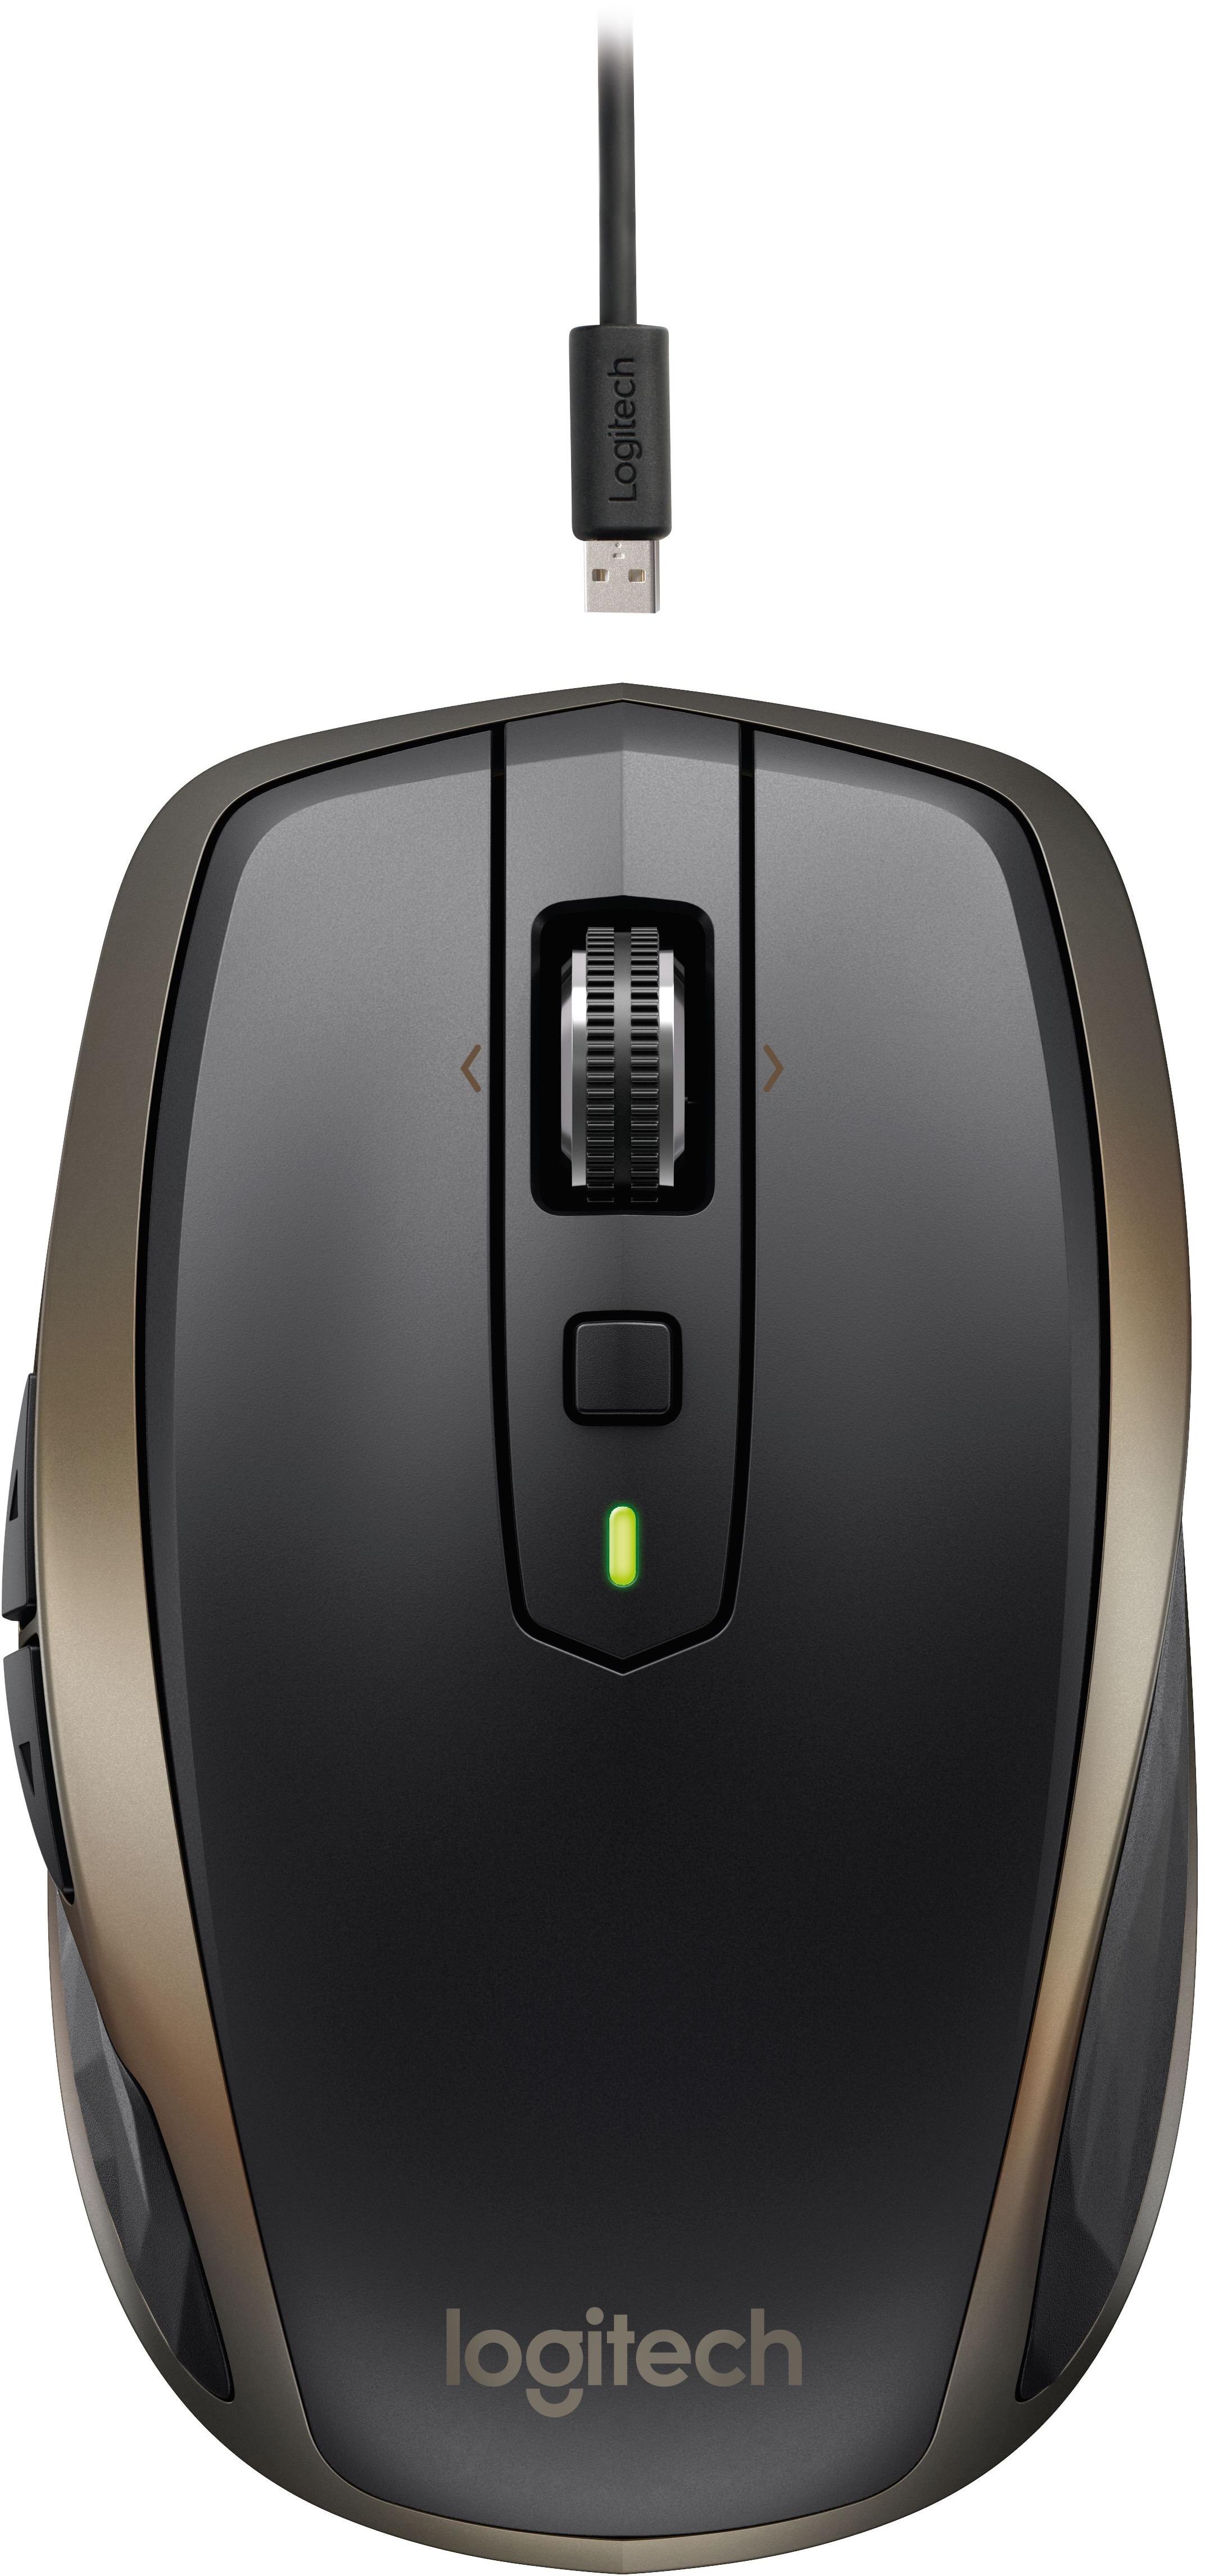 Mouse MX Anywhere 2, da Logitech